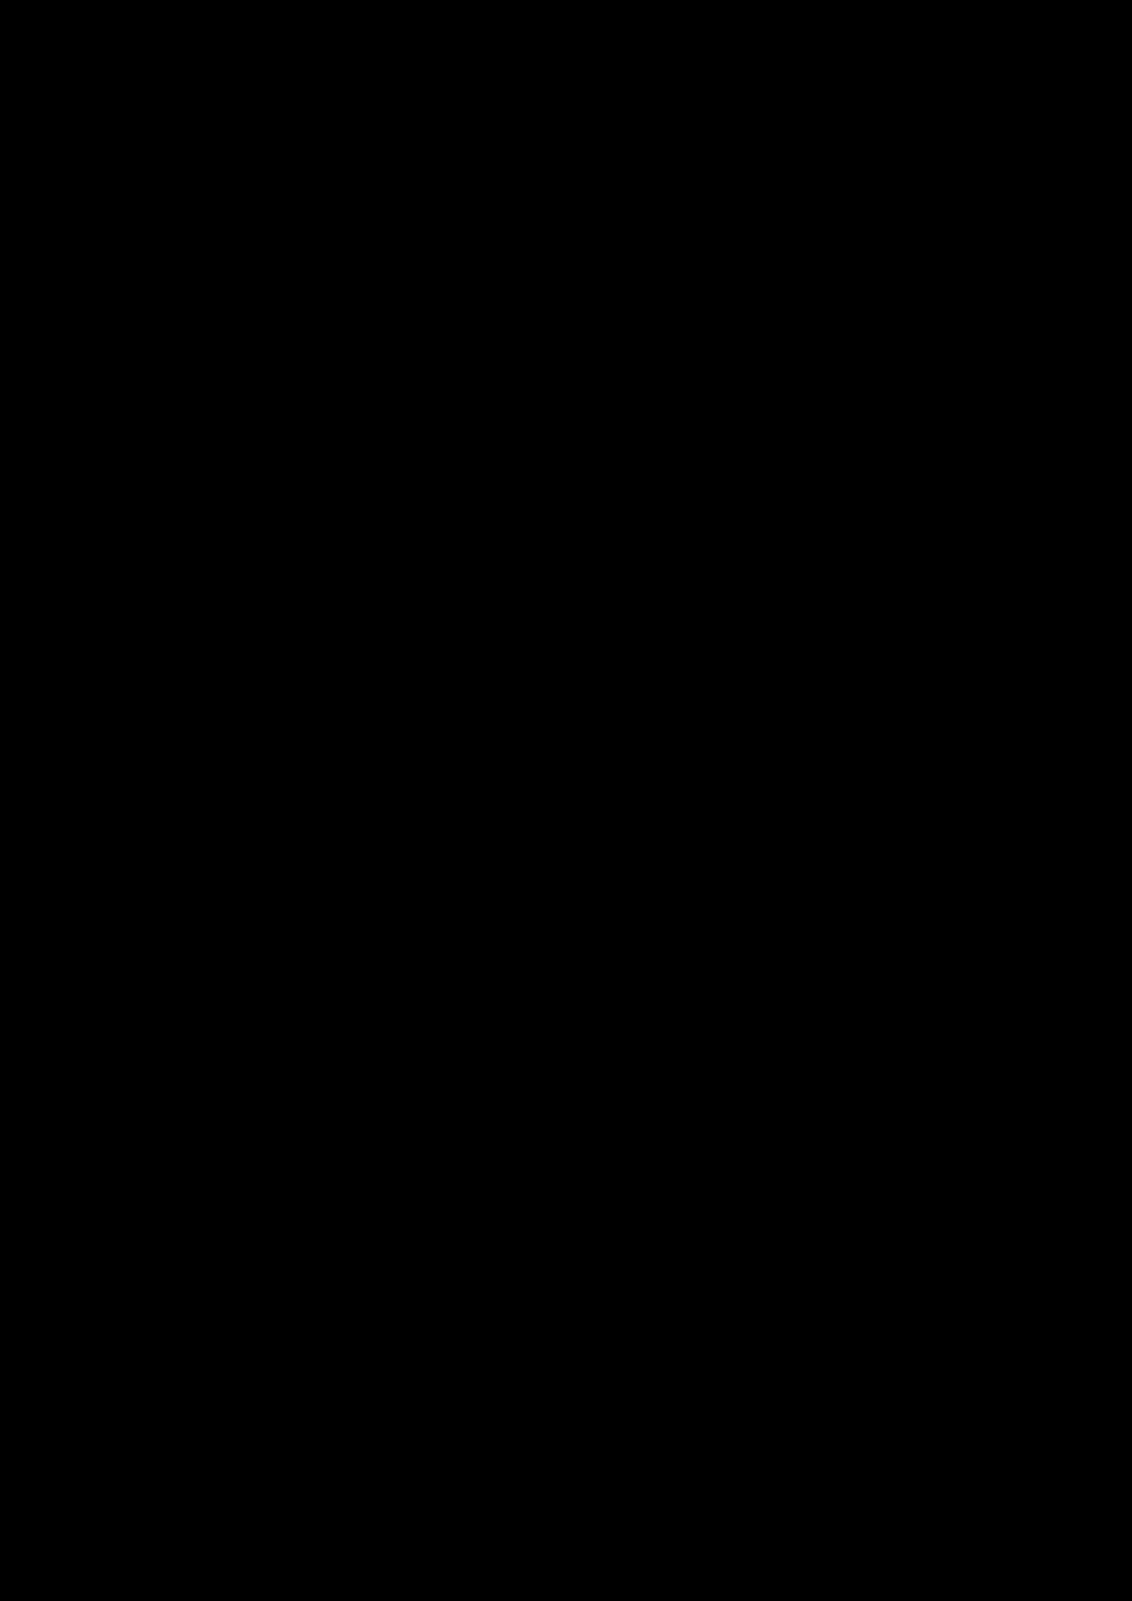 Belyiy sokol slide, Image 203